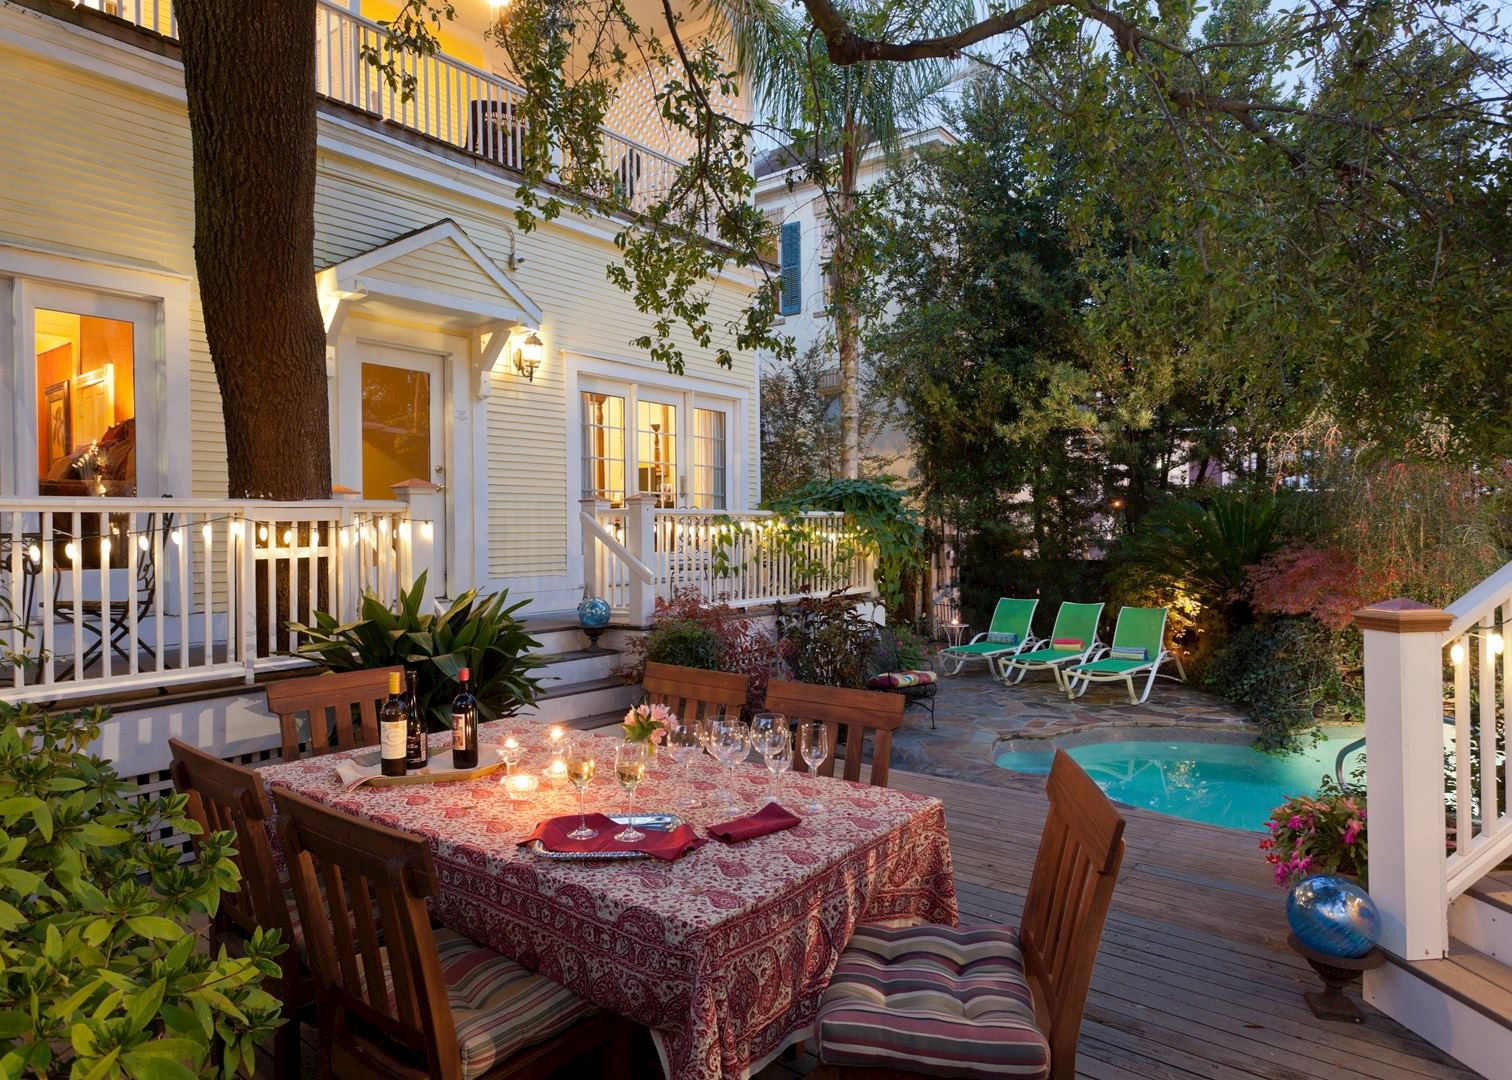 Azalea Inn Gardens Hotels In Savannah Audley Travel